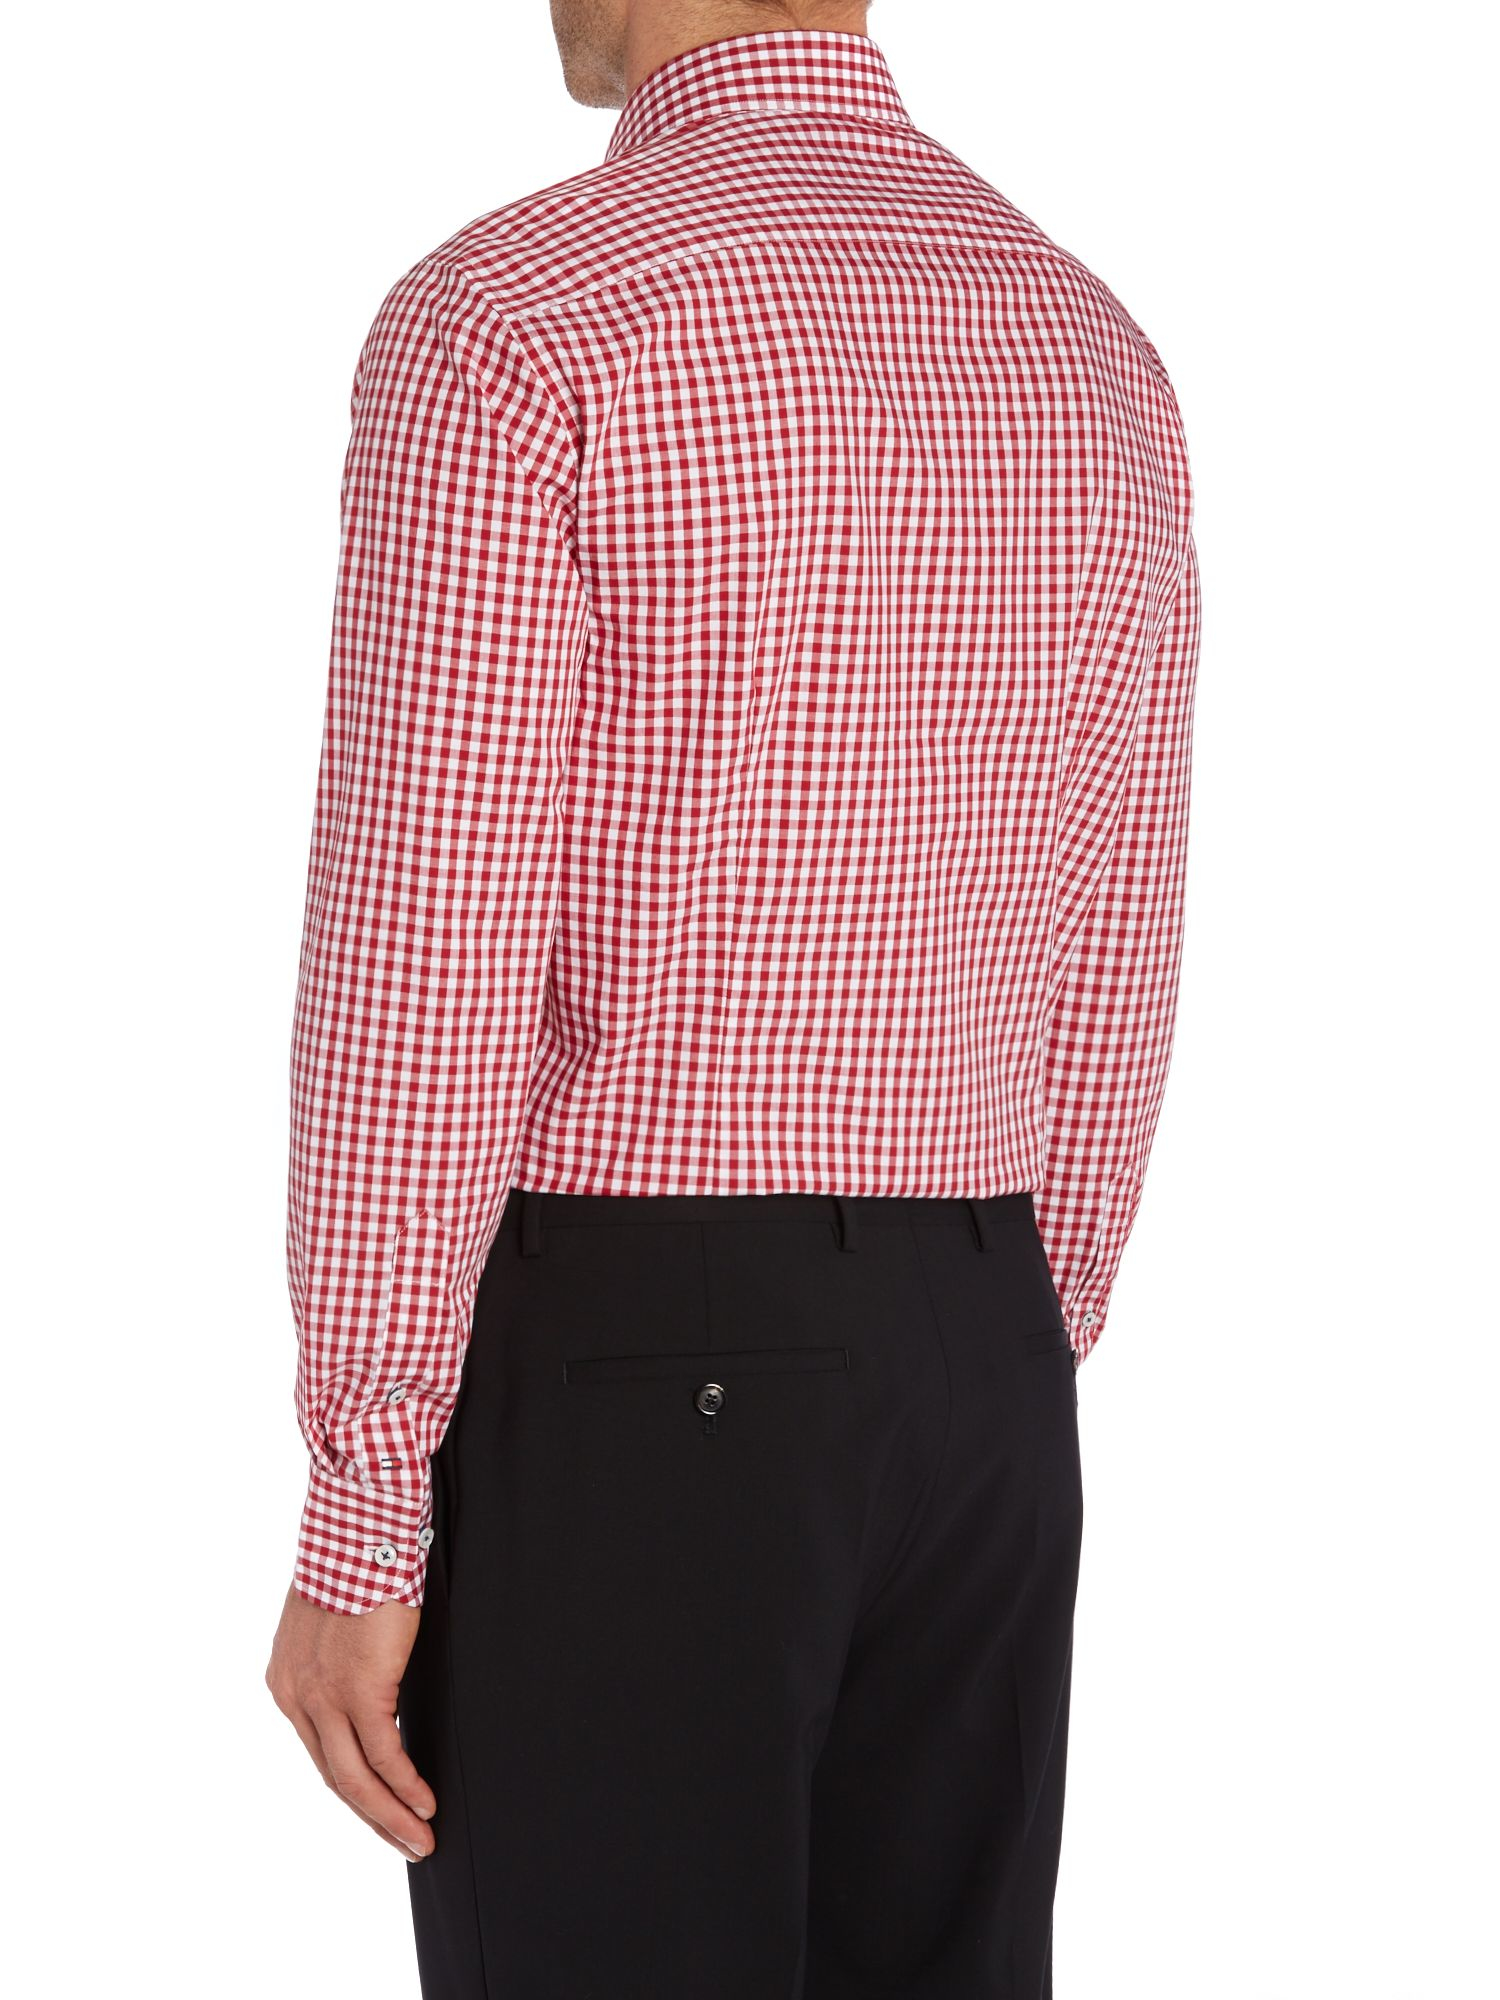 Tommy Hilfiger Slim Fit Gingham Shirt In Red For Men Lyst